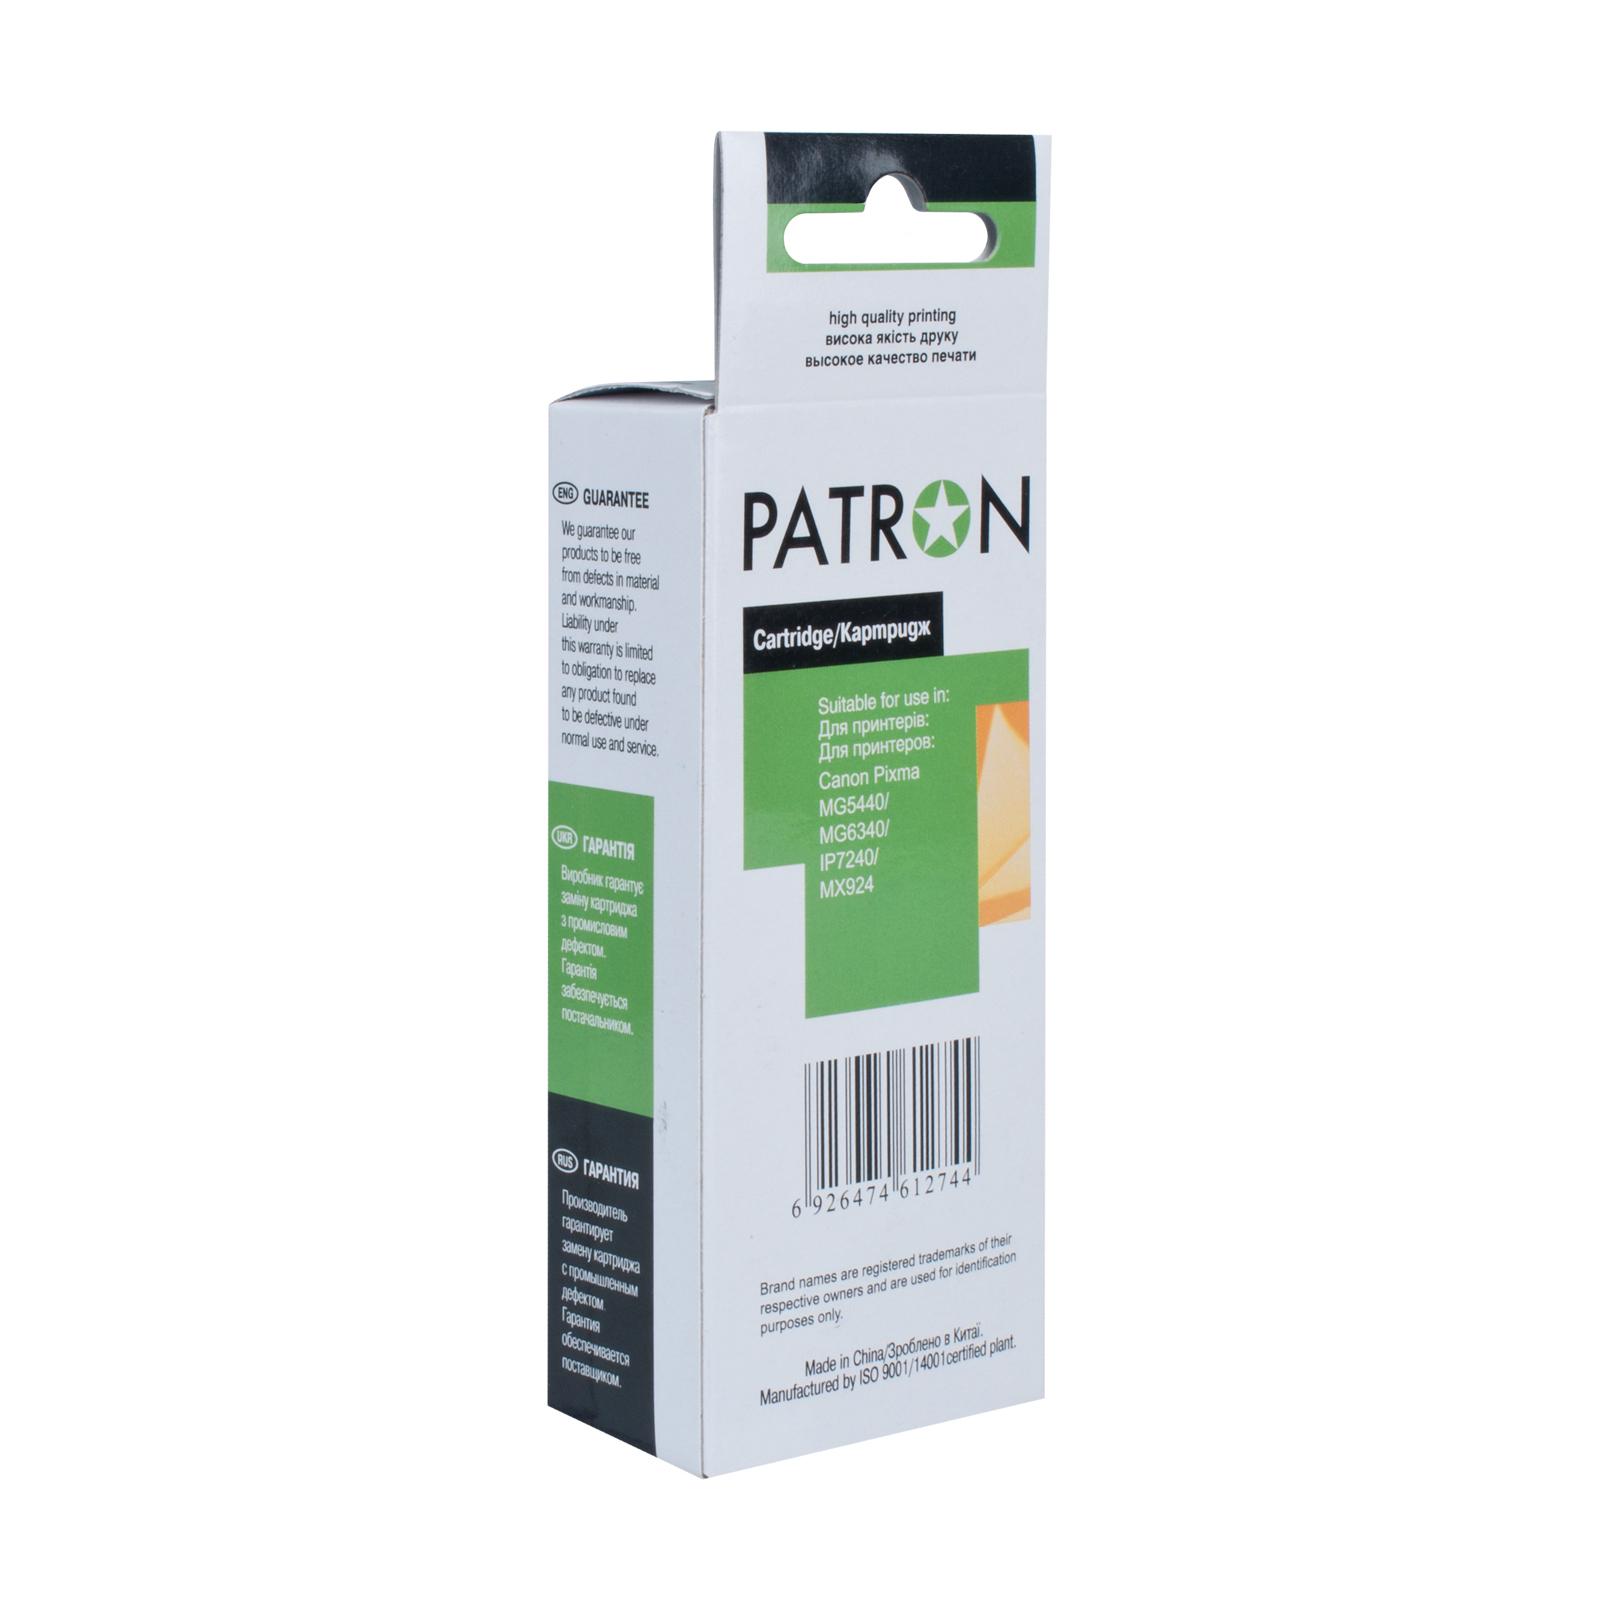 Картридж PATRON CANON PGI-450XLBk (PN-450XLBK) BLACK (CI-CAN-PGI-450-B-PN) изображение 8